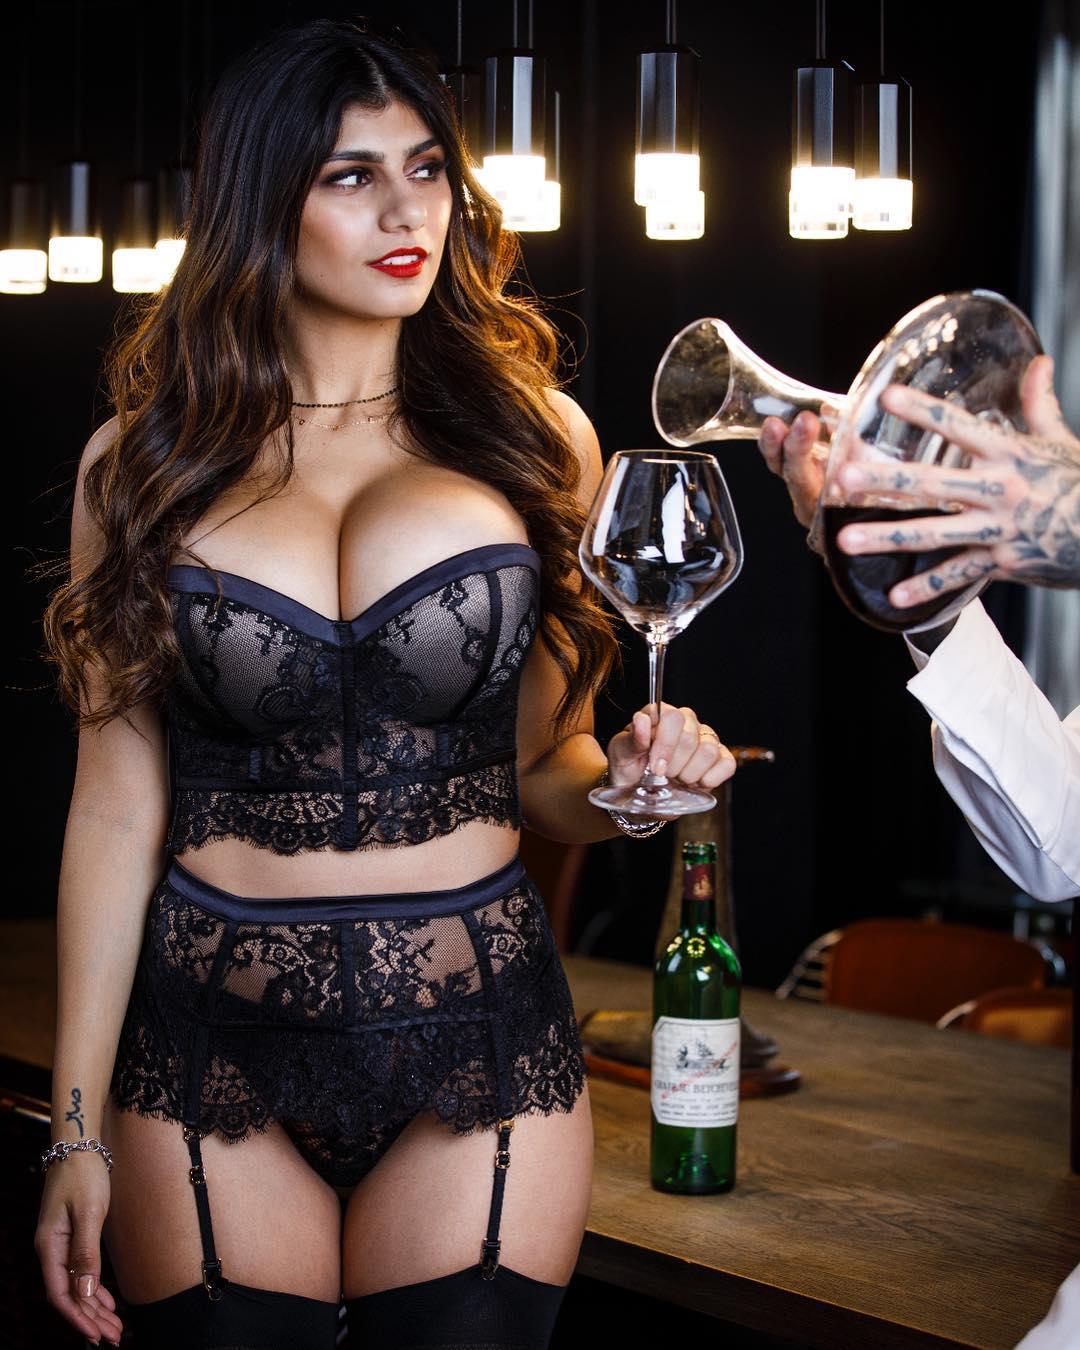 Mia Khalifa Hd Hot  Sexy Photos  Instagram Viral - Pro -5533